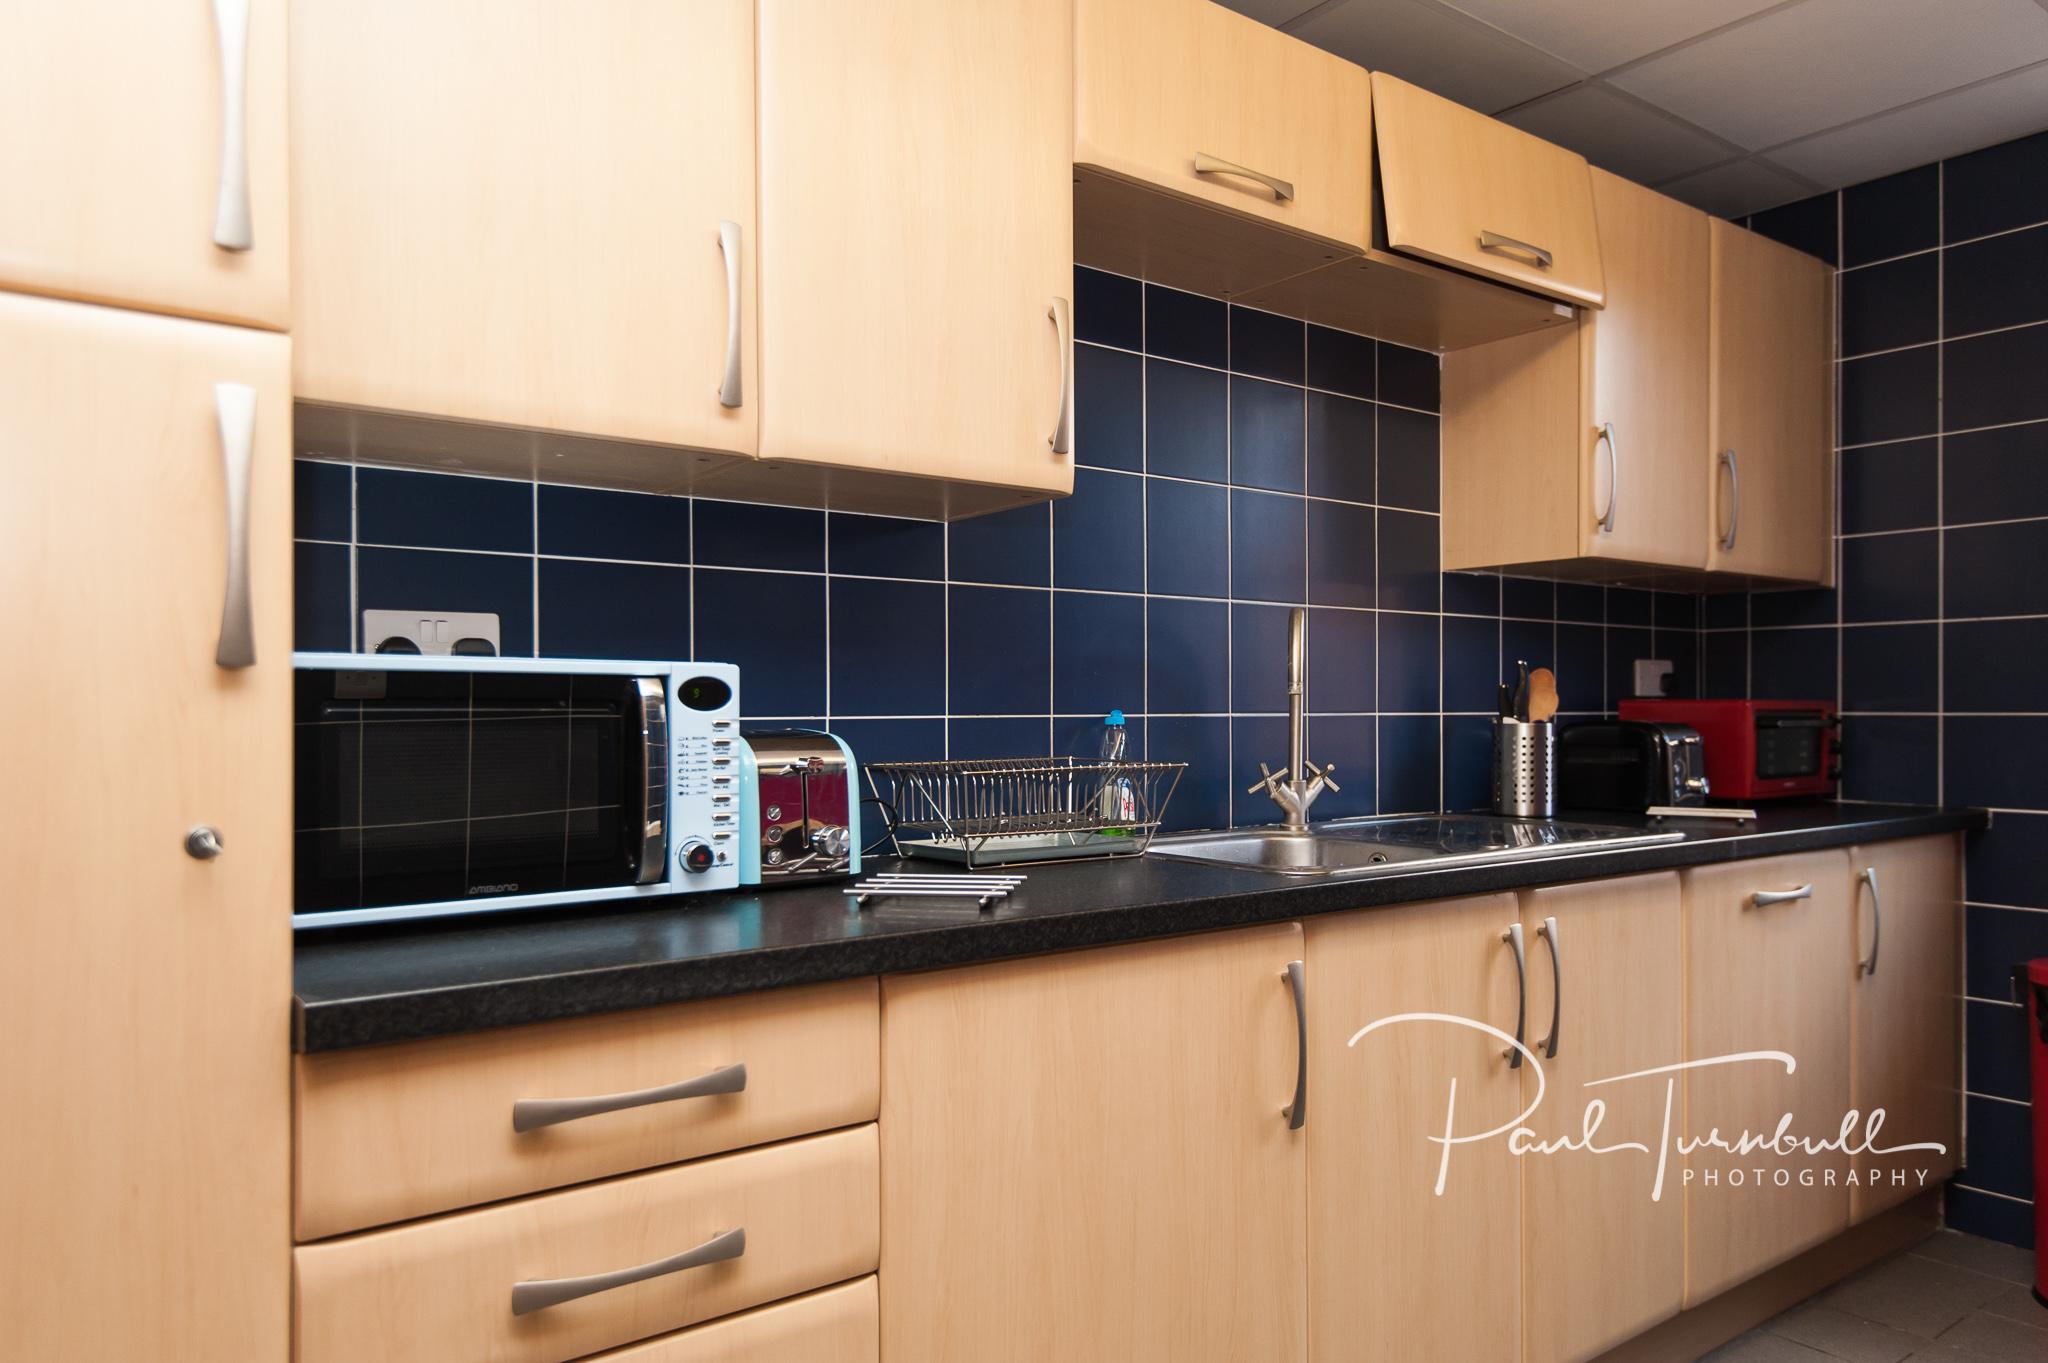 commercial-property-photographer-leeds-yorkshire-rs-hostels-010.jpg